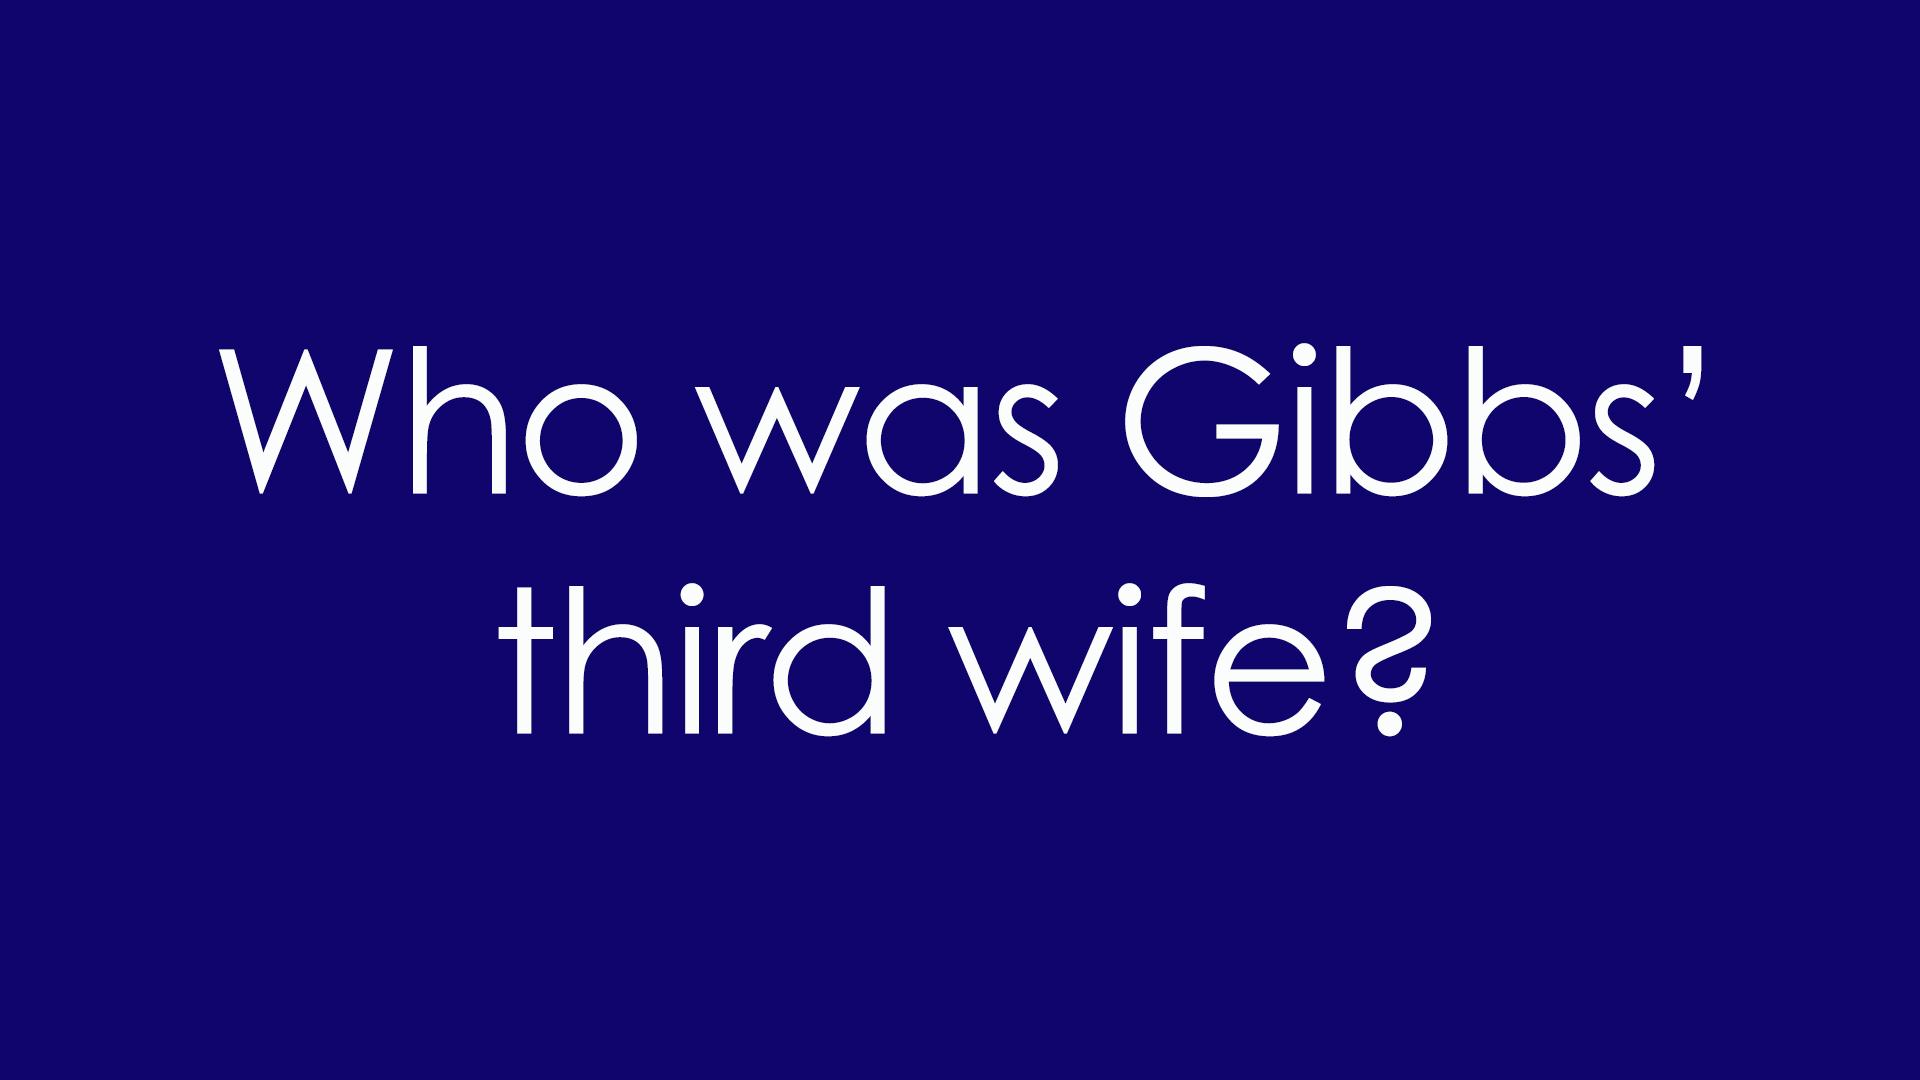 7. Who was Gibbs' third wife?